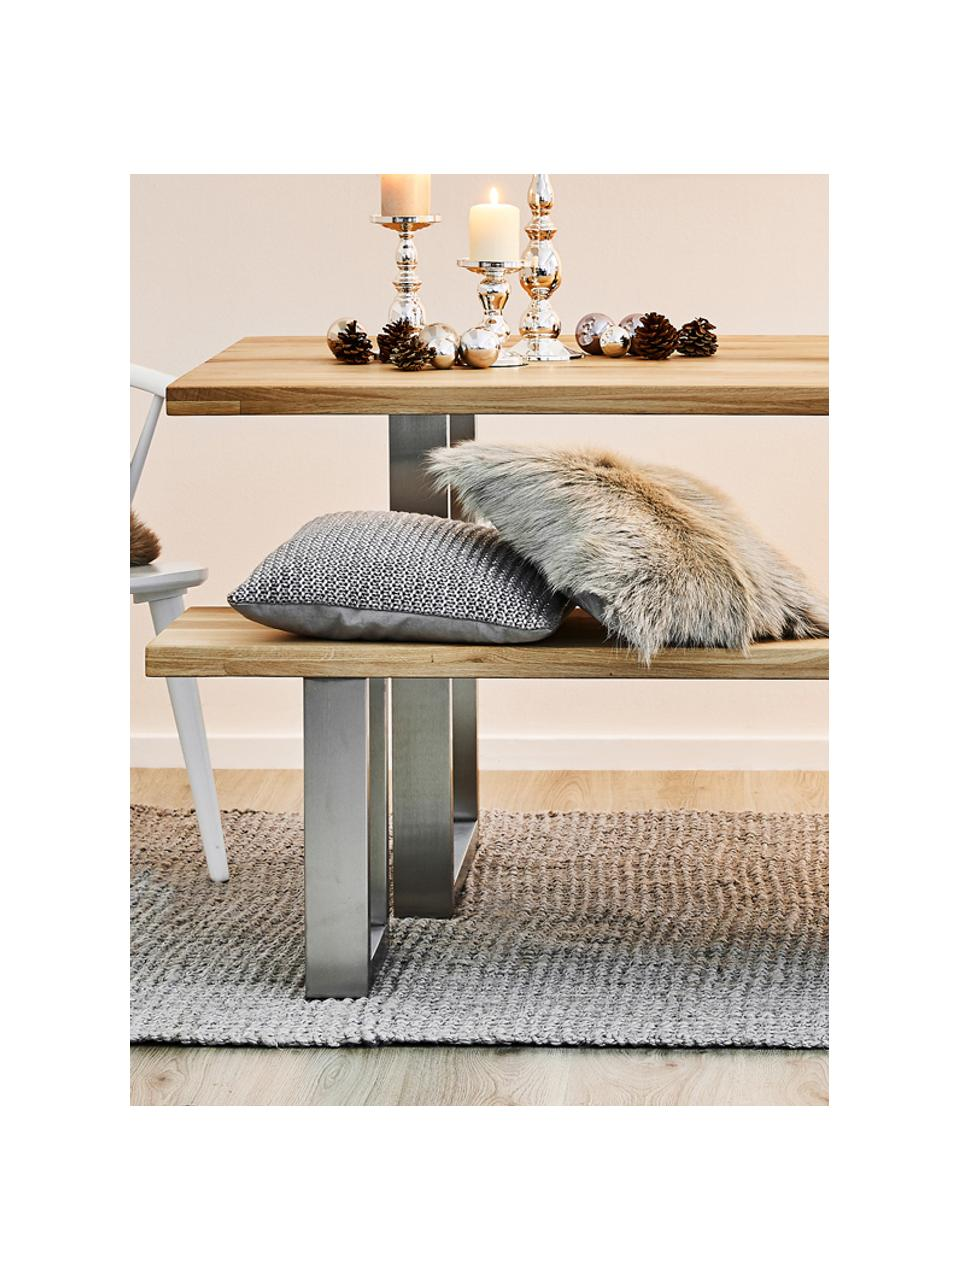 Table avec plateau en bois massif Oliver, Chêne sauvage, acier inoxydable